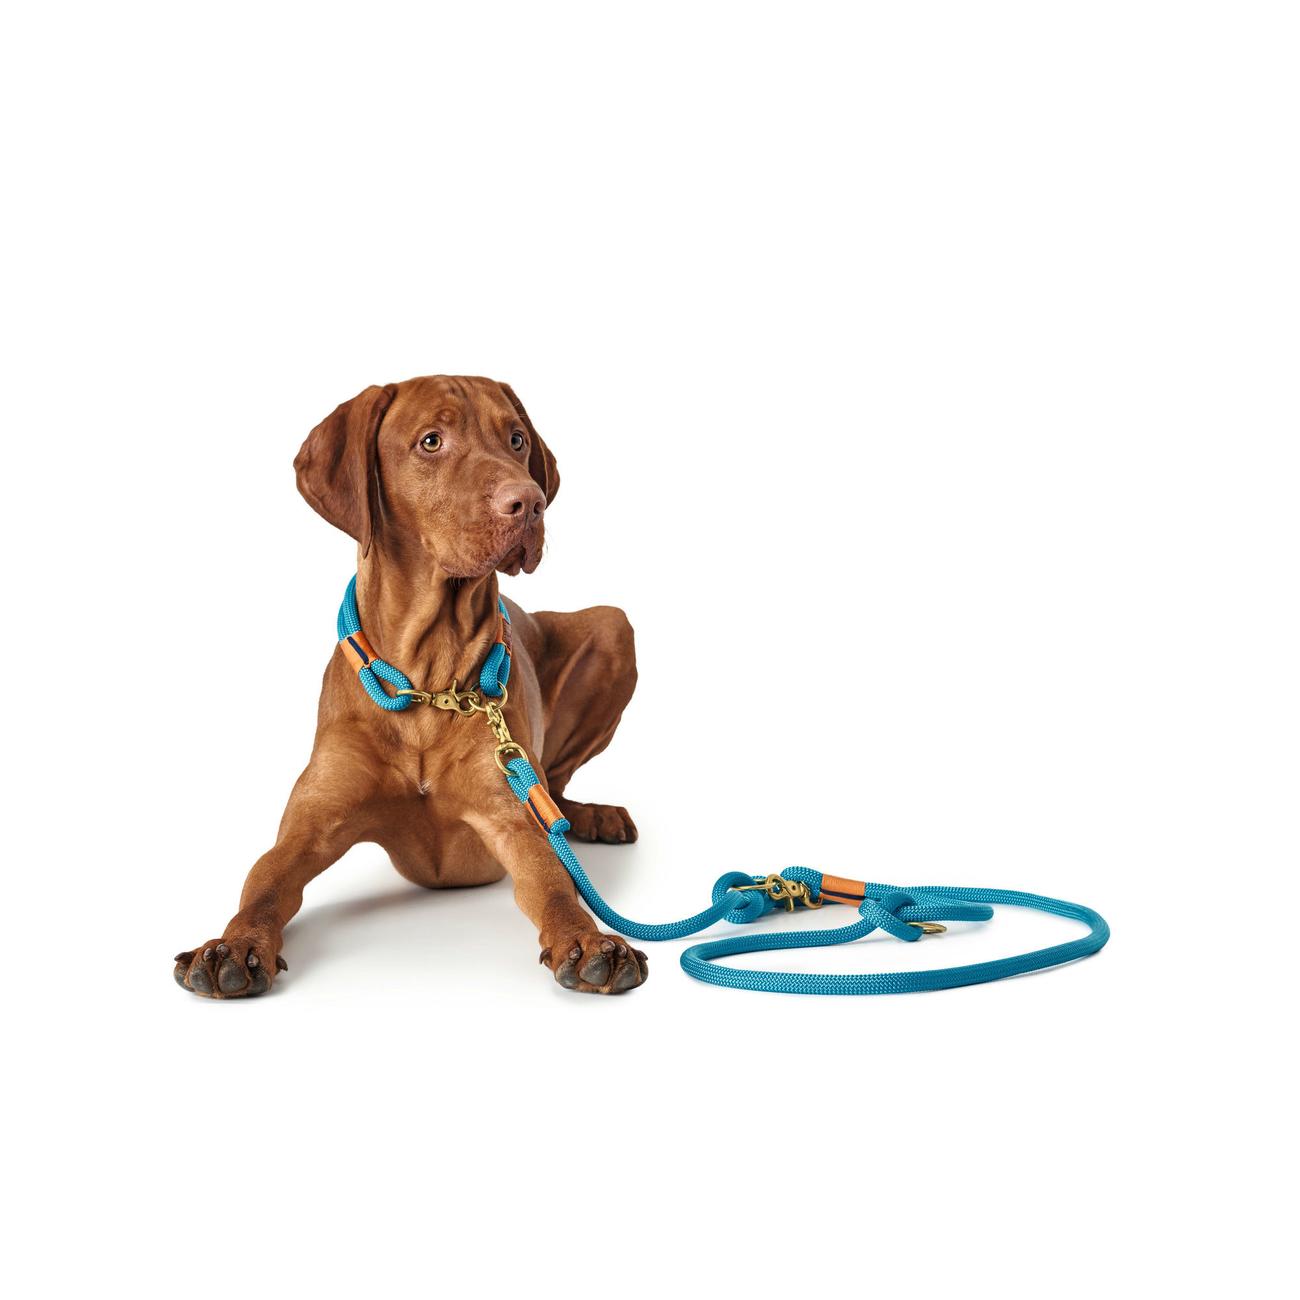 Hunter Halsung Halsband Oss für Hunde 66989, Bild 8